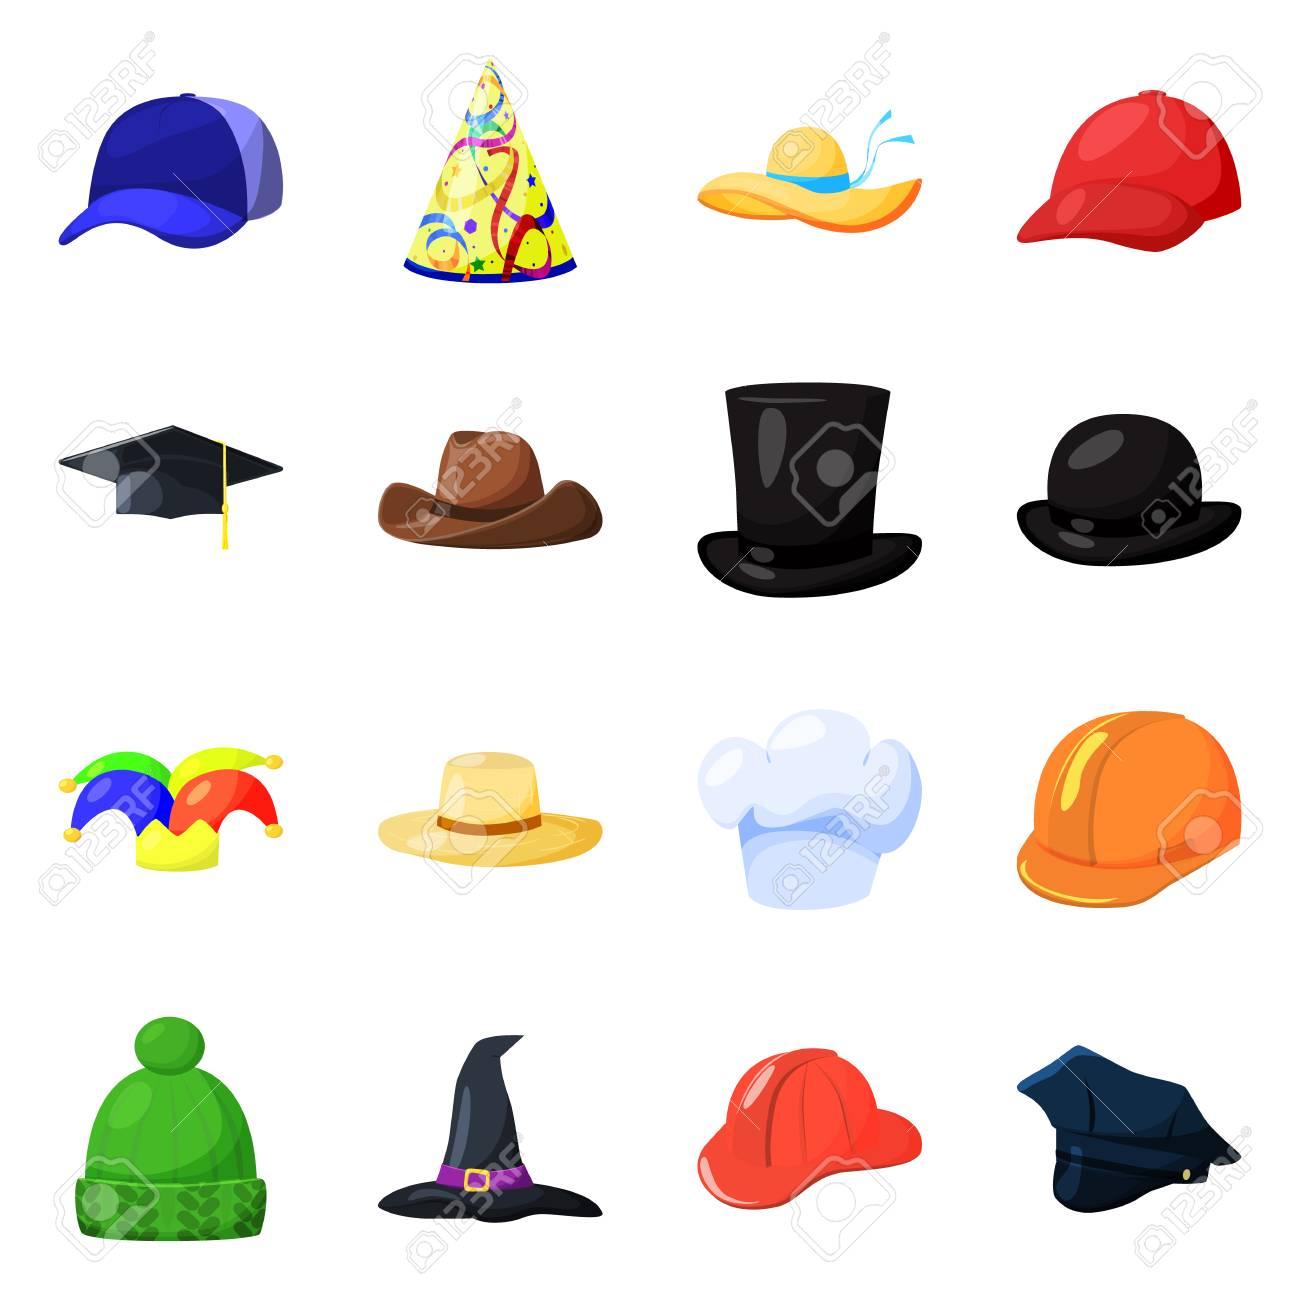 Vector illustration of headgear and napper logo. Collection of headgear and helmet vector icon for stock. - 126078778